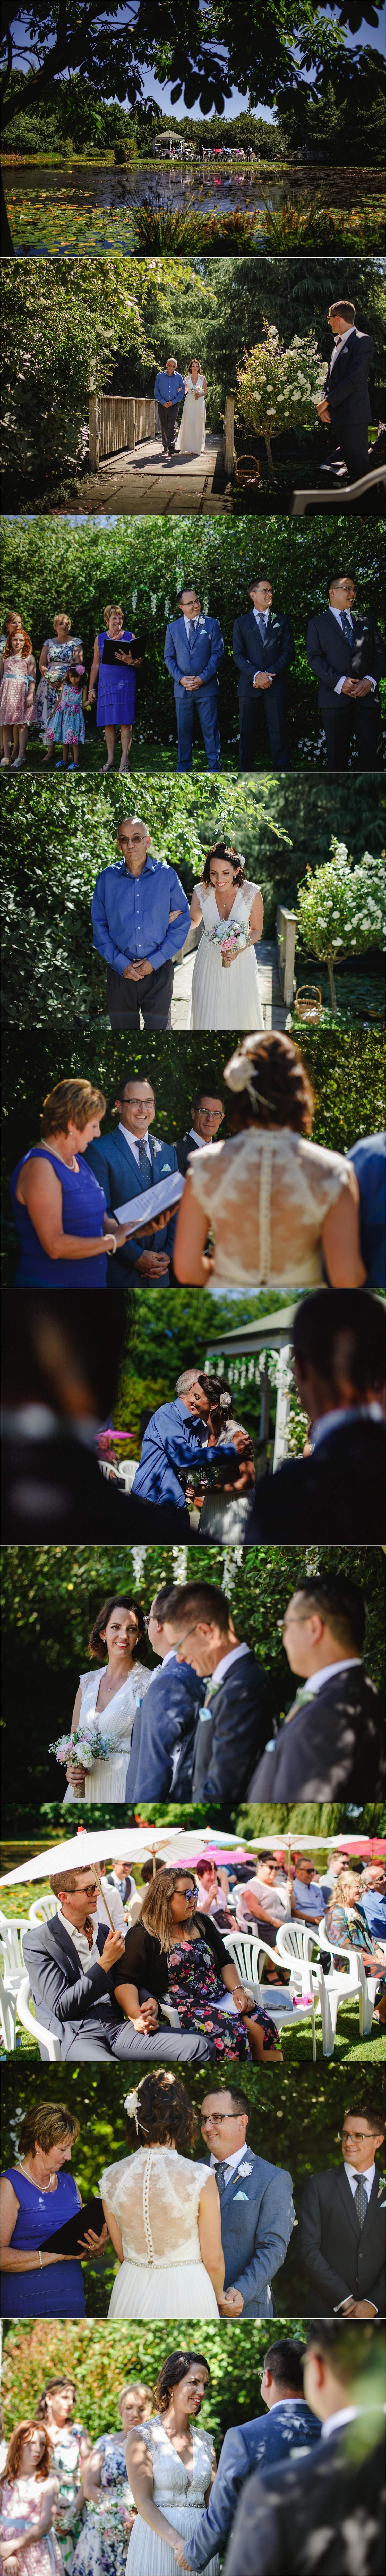 sarnia park ceremony